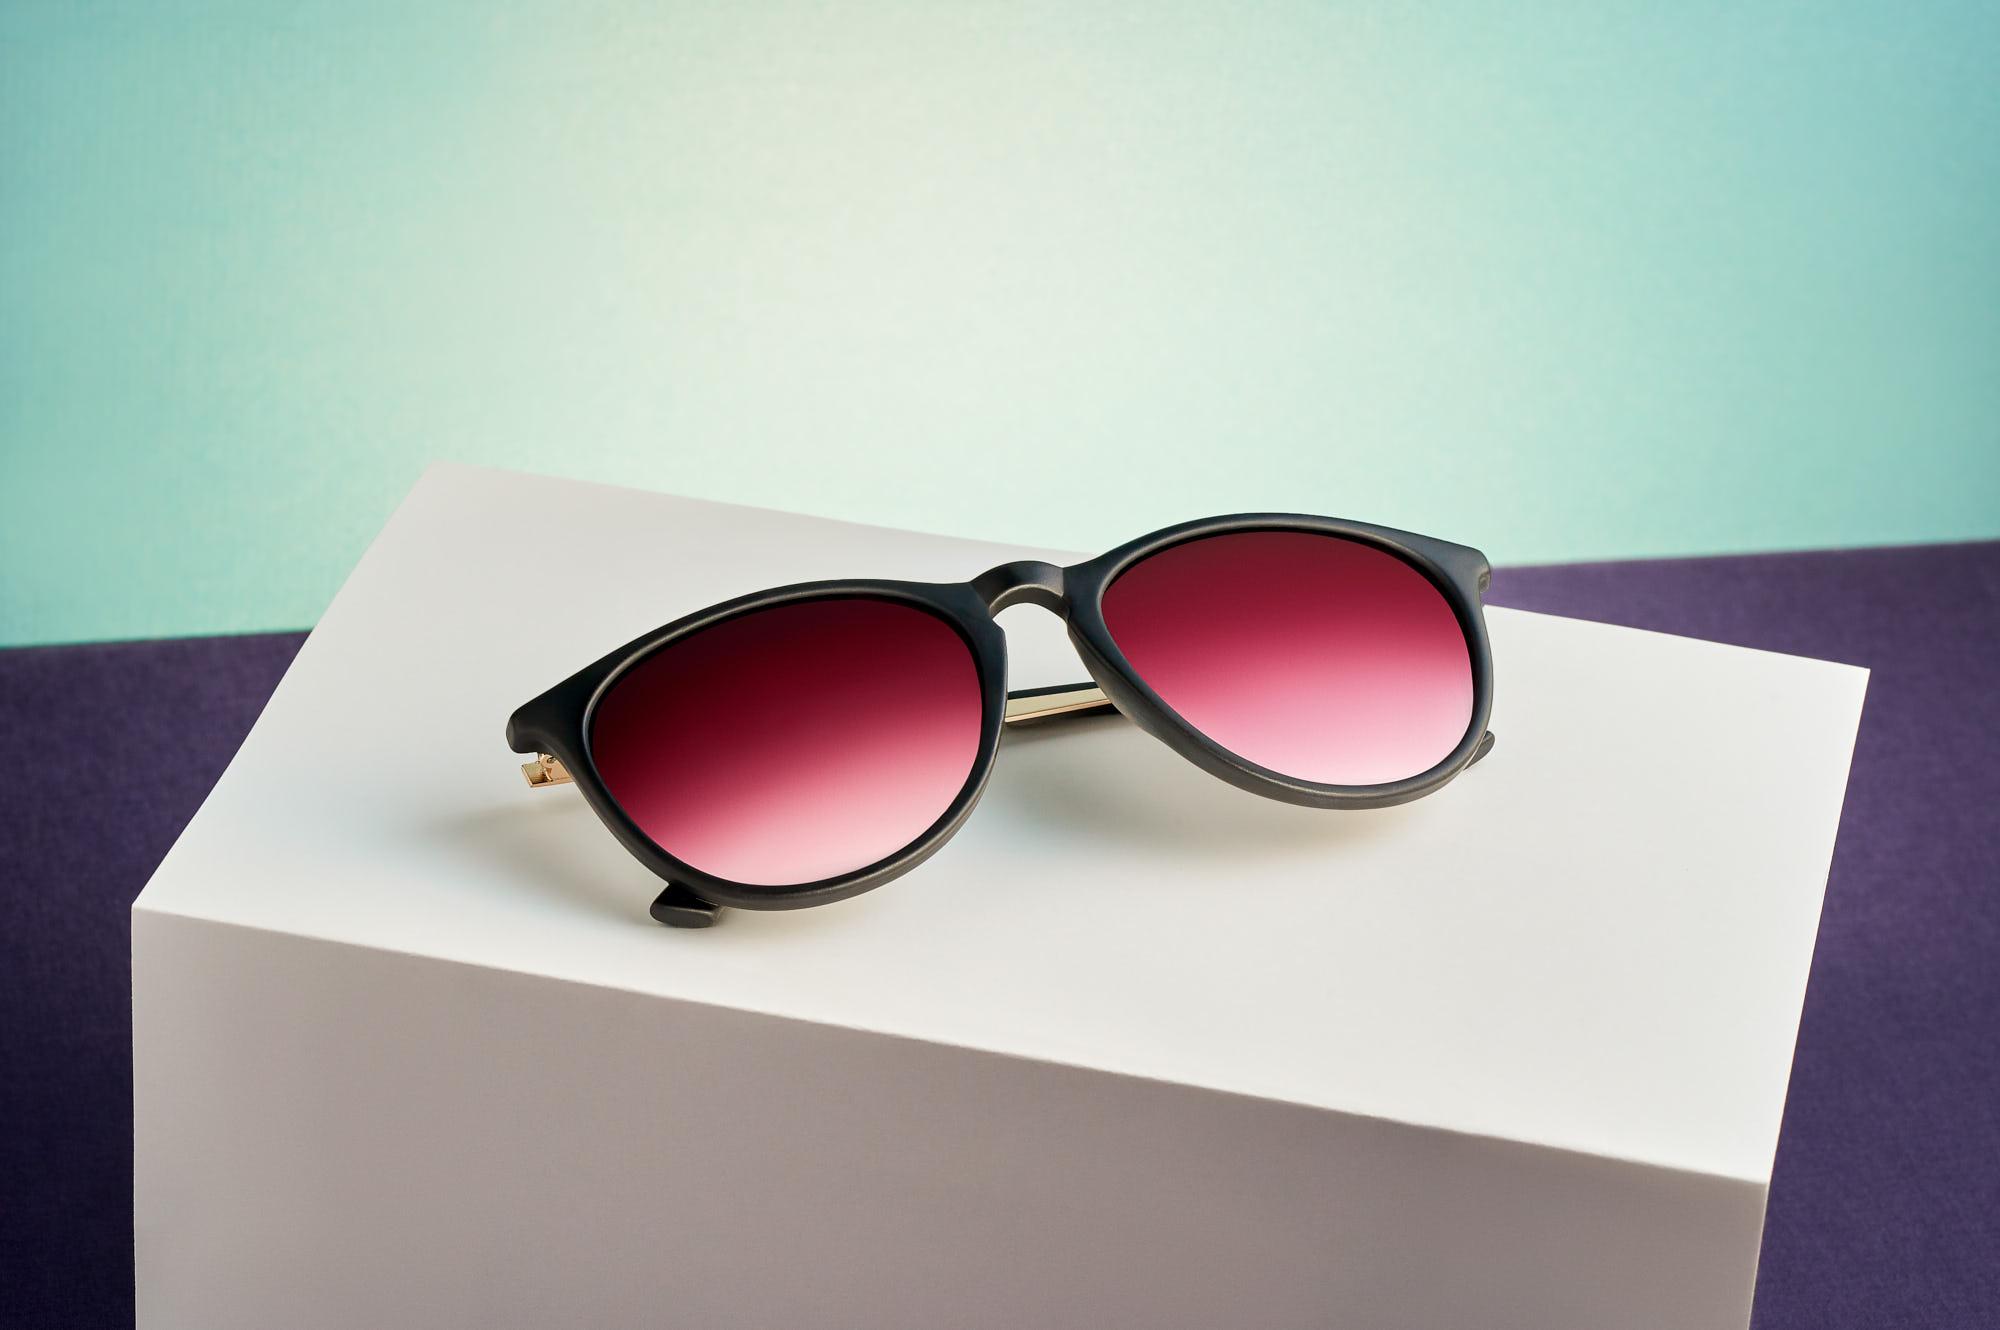 Lex & Josh Graphic Sunglasses Product Shoot 2.jpg